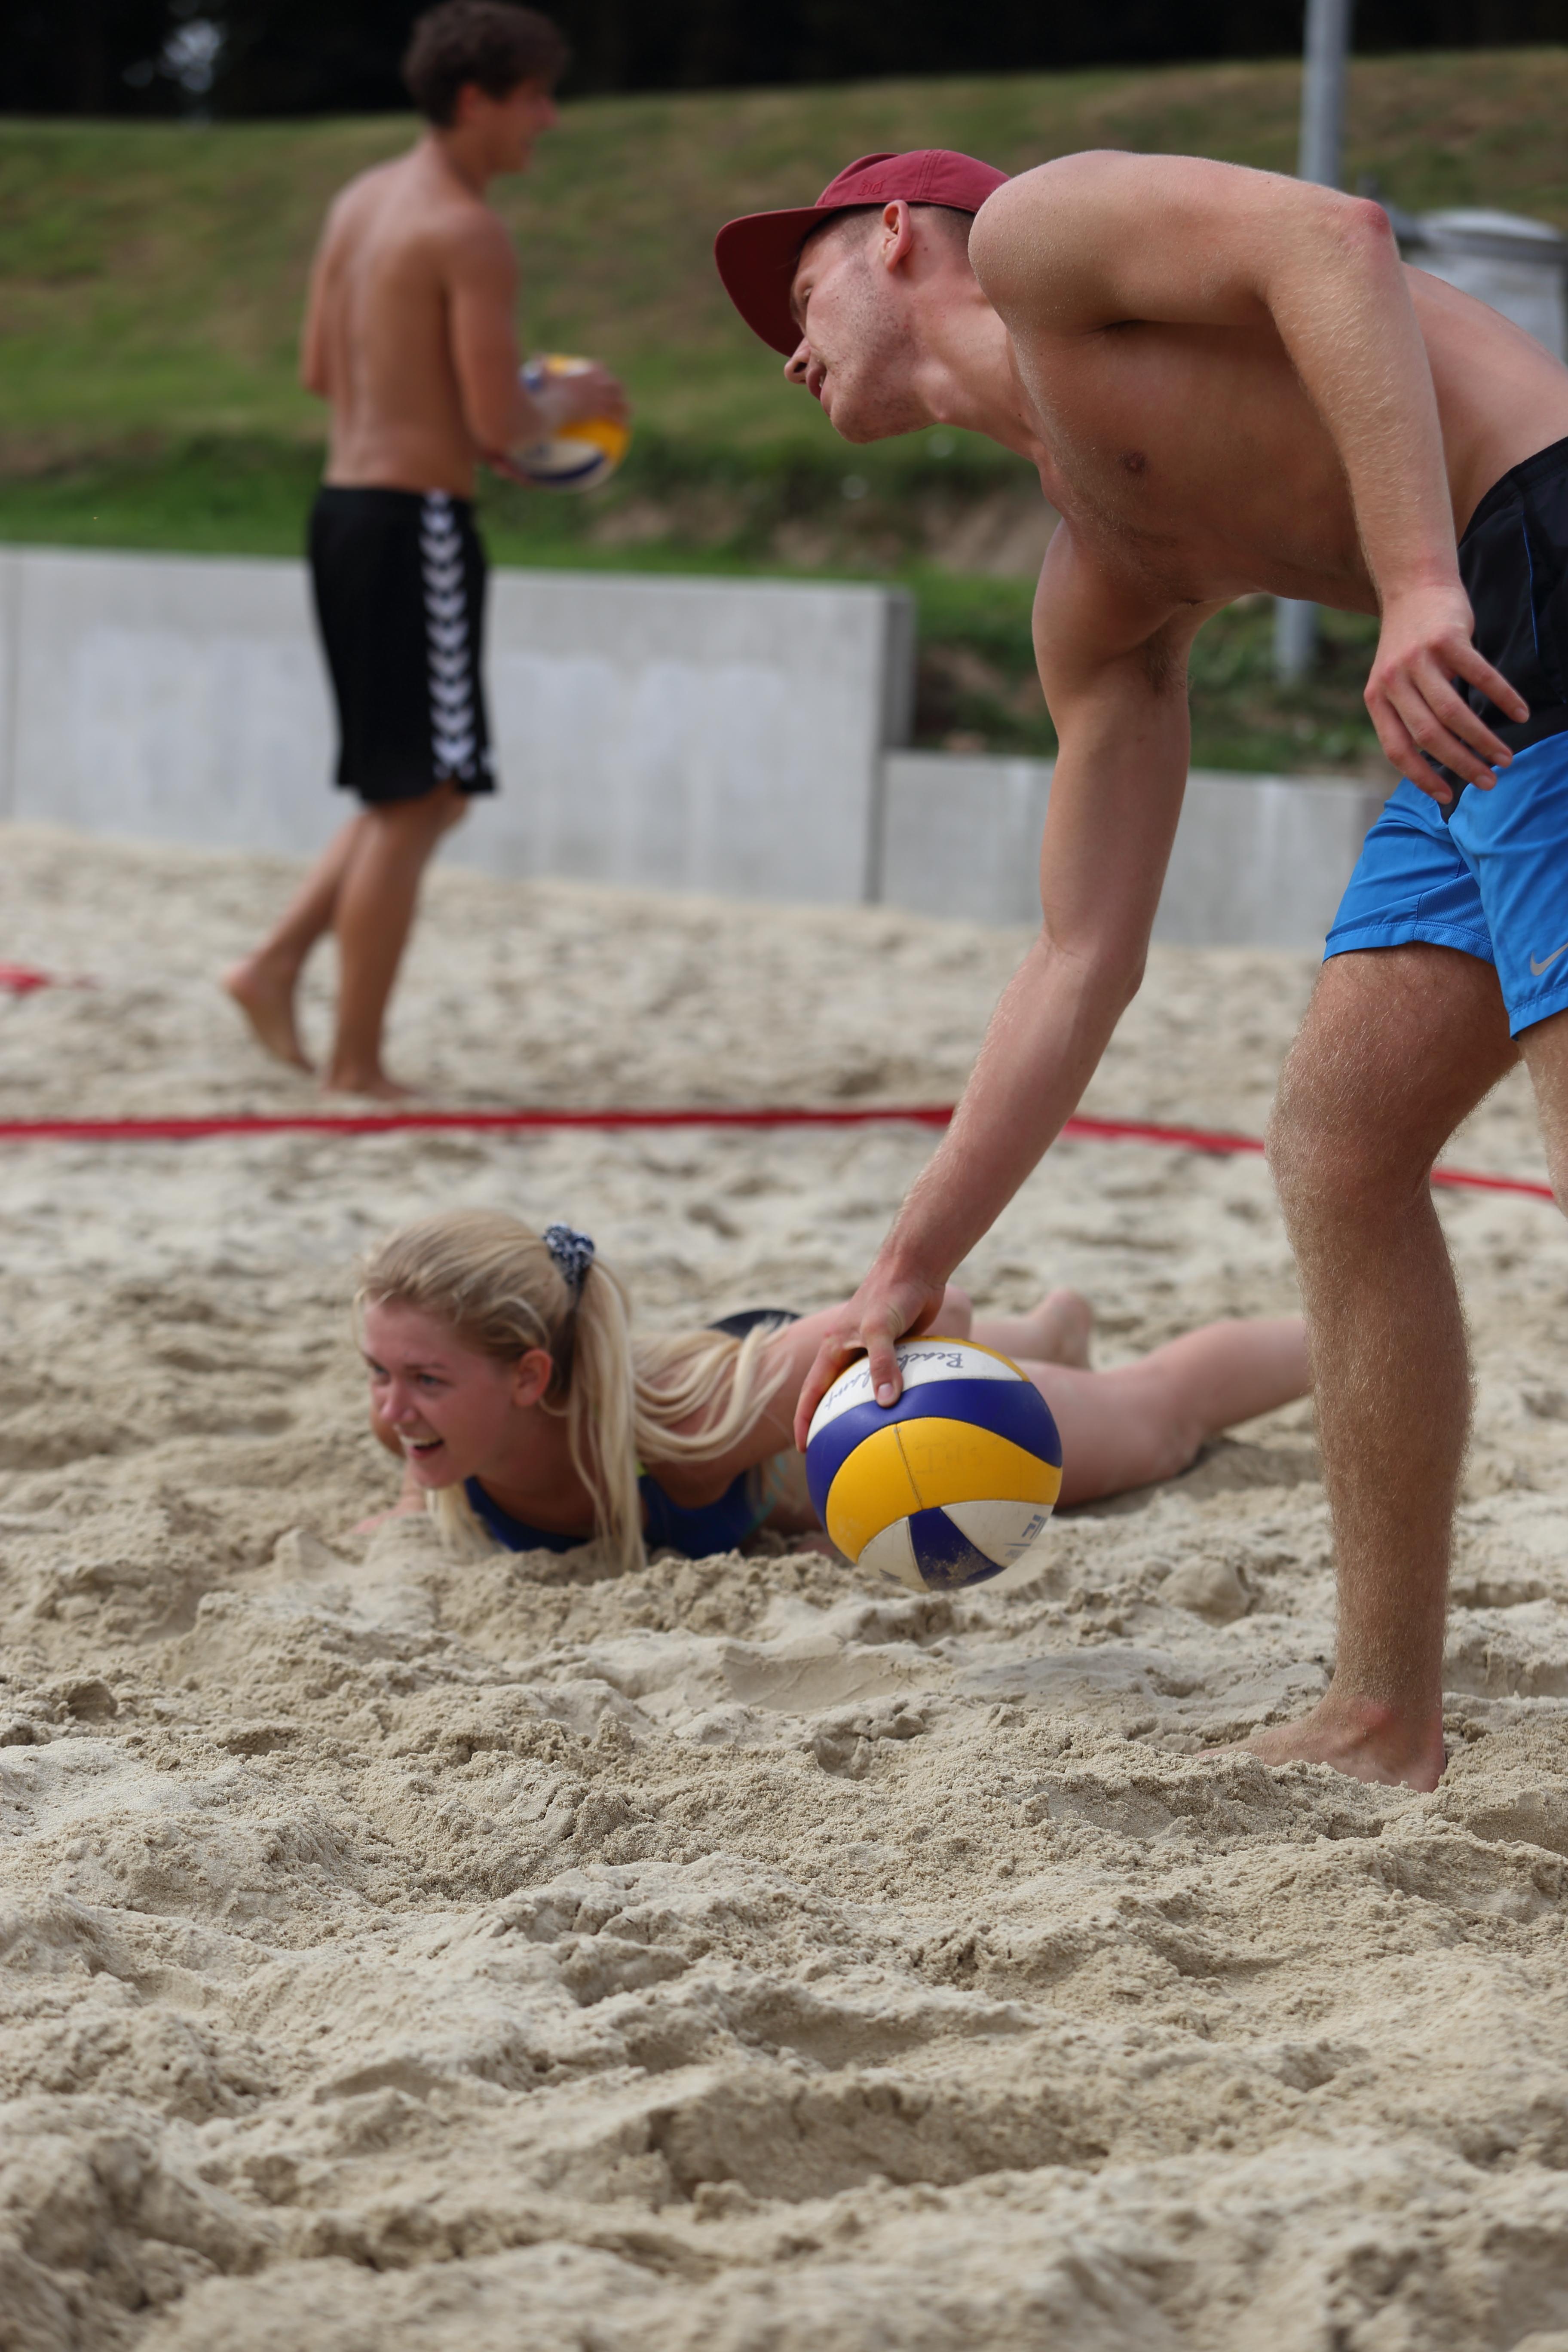 The softest sandbox